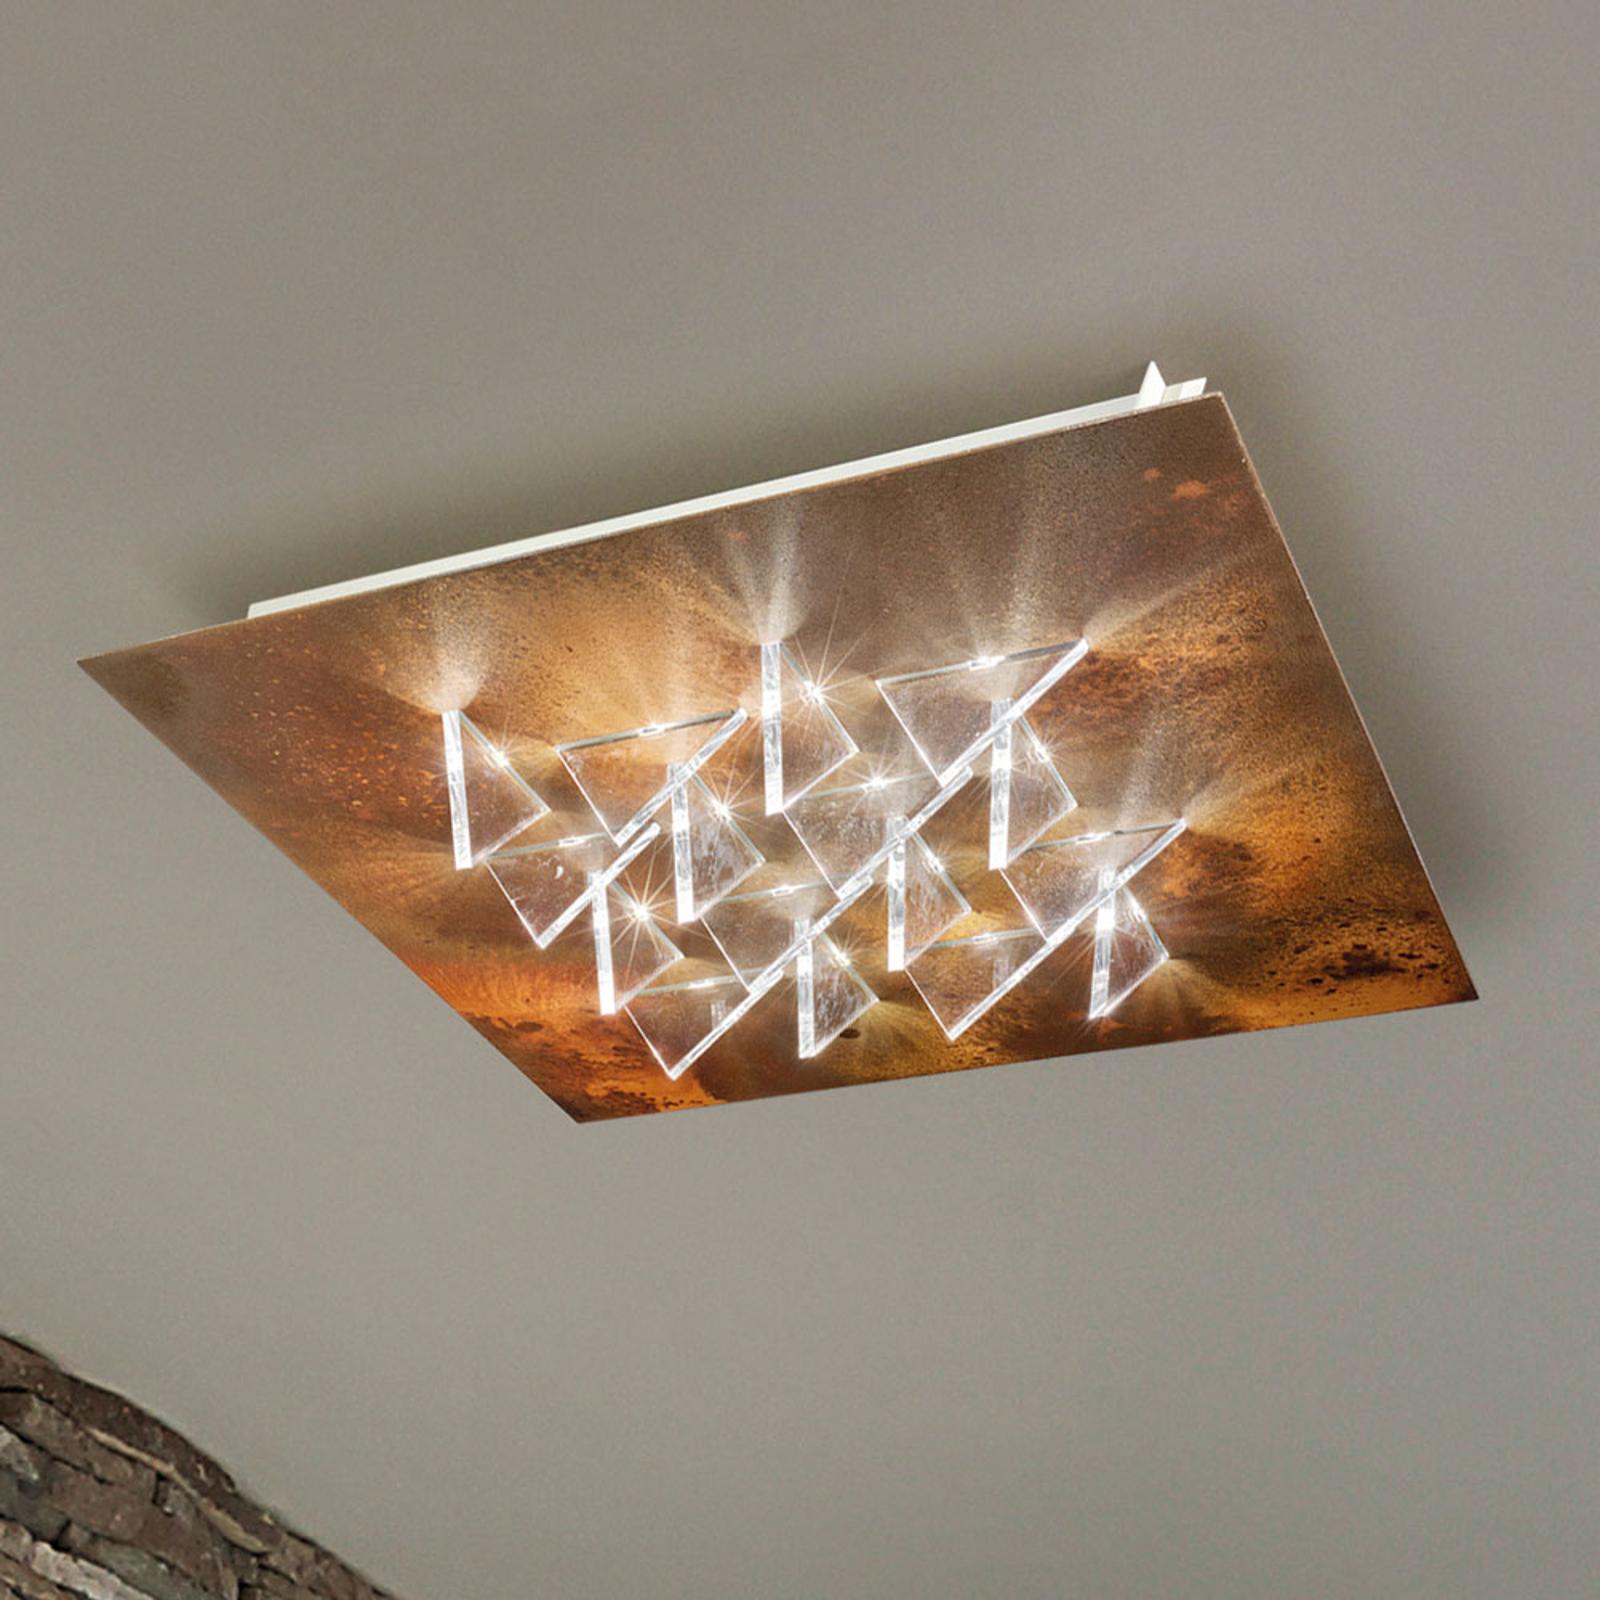 Effektfull LED-taklampe Cristalli, rust